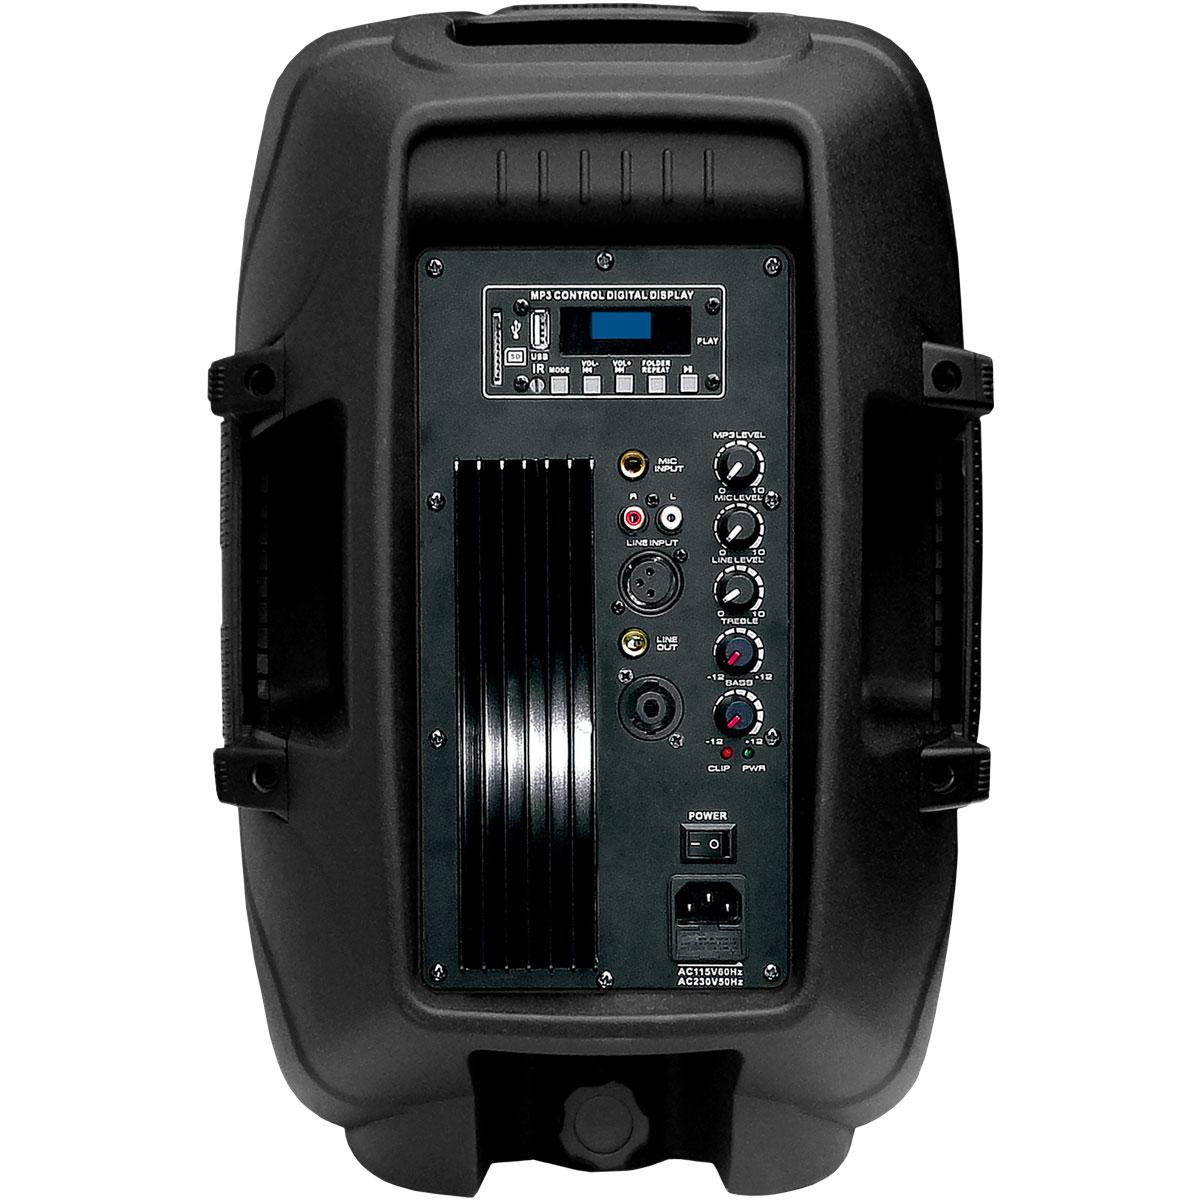 Caixa Ativa Fal 10 Pol 100W c/ USB / Bluetooth CSR 5510 USB BT - CSR